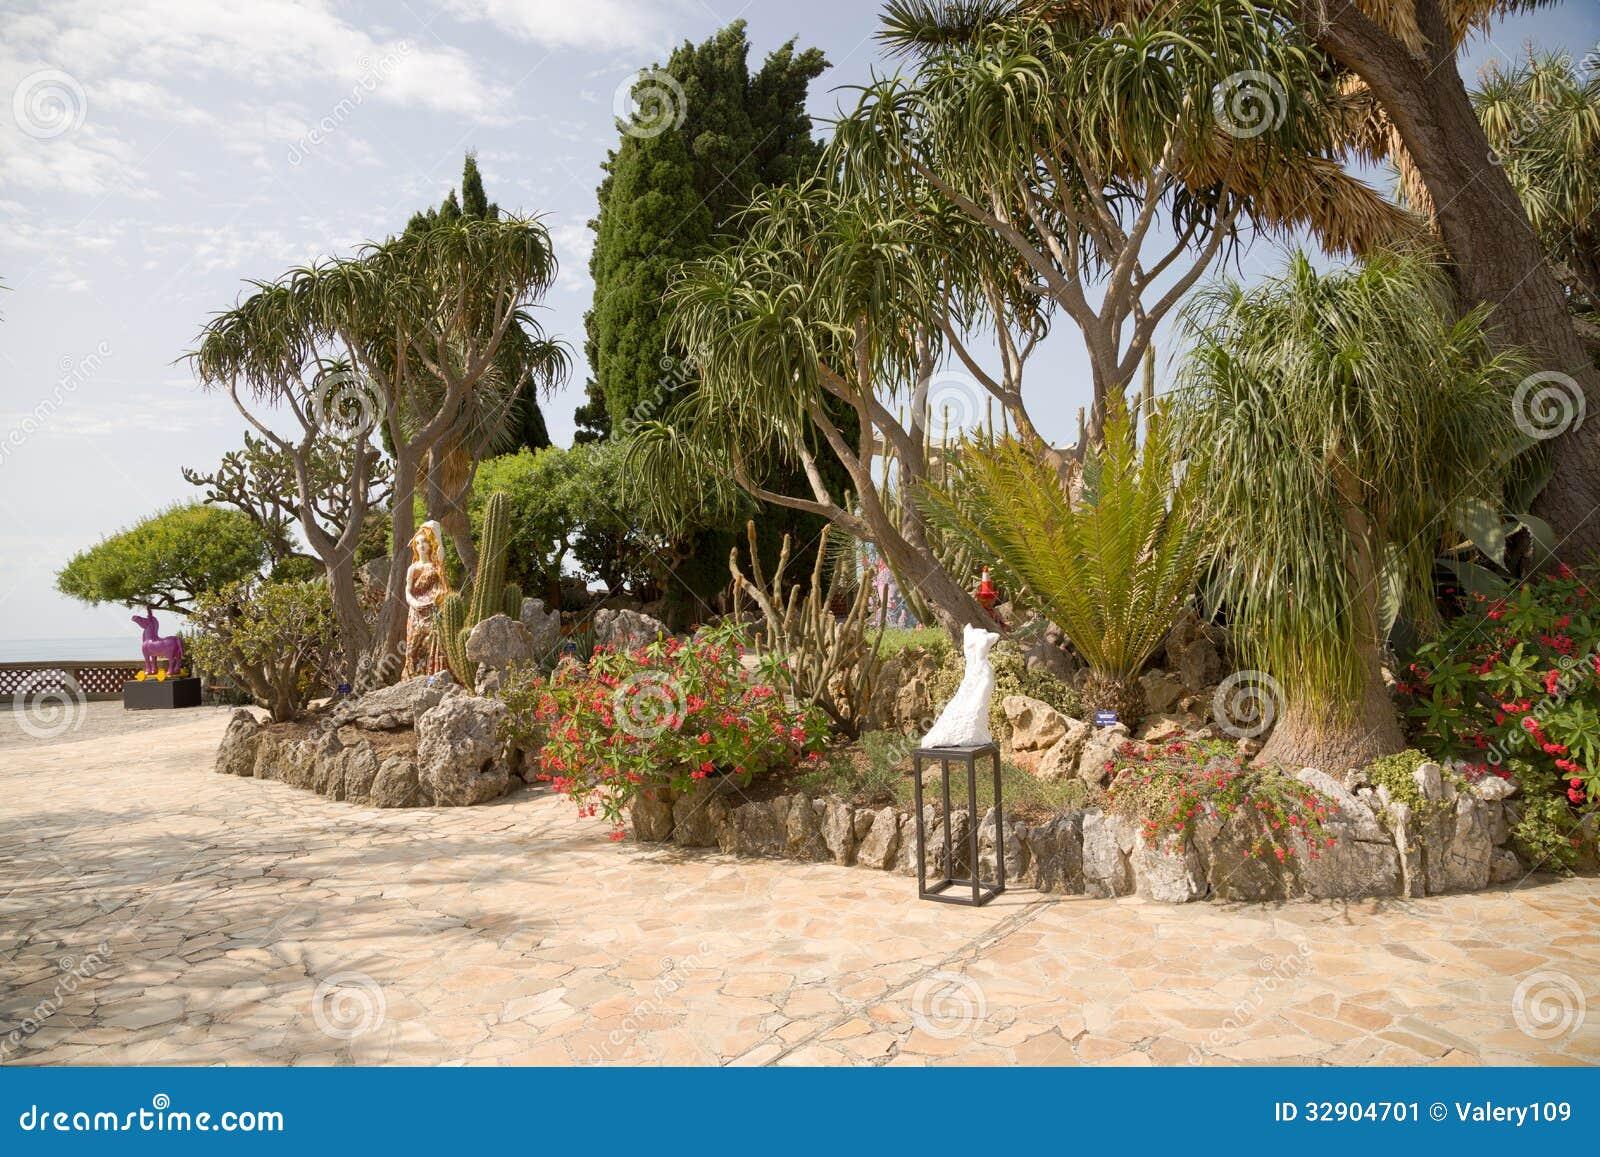 the exotic garden of monaco stock image image 32904701. Black Bedroom Furniture Sets. Home Design Ideas